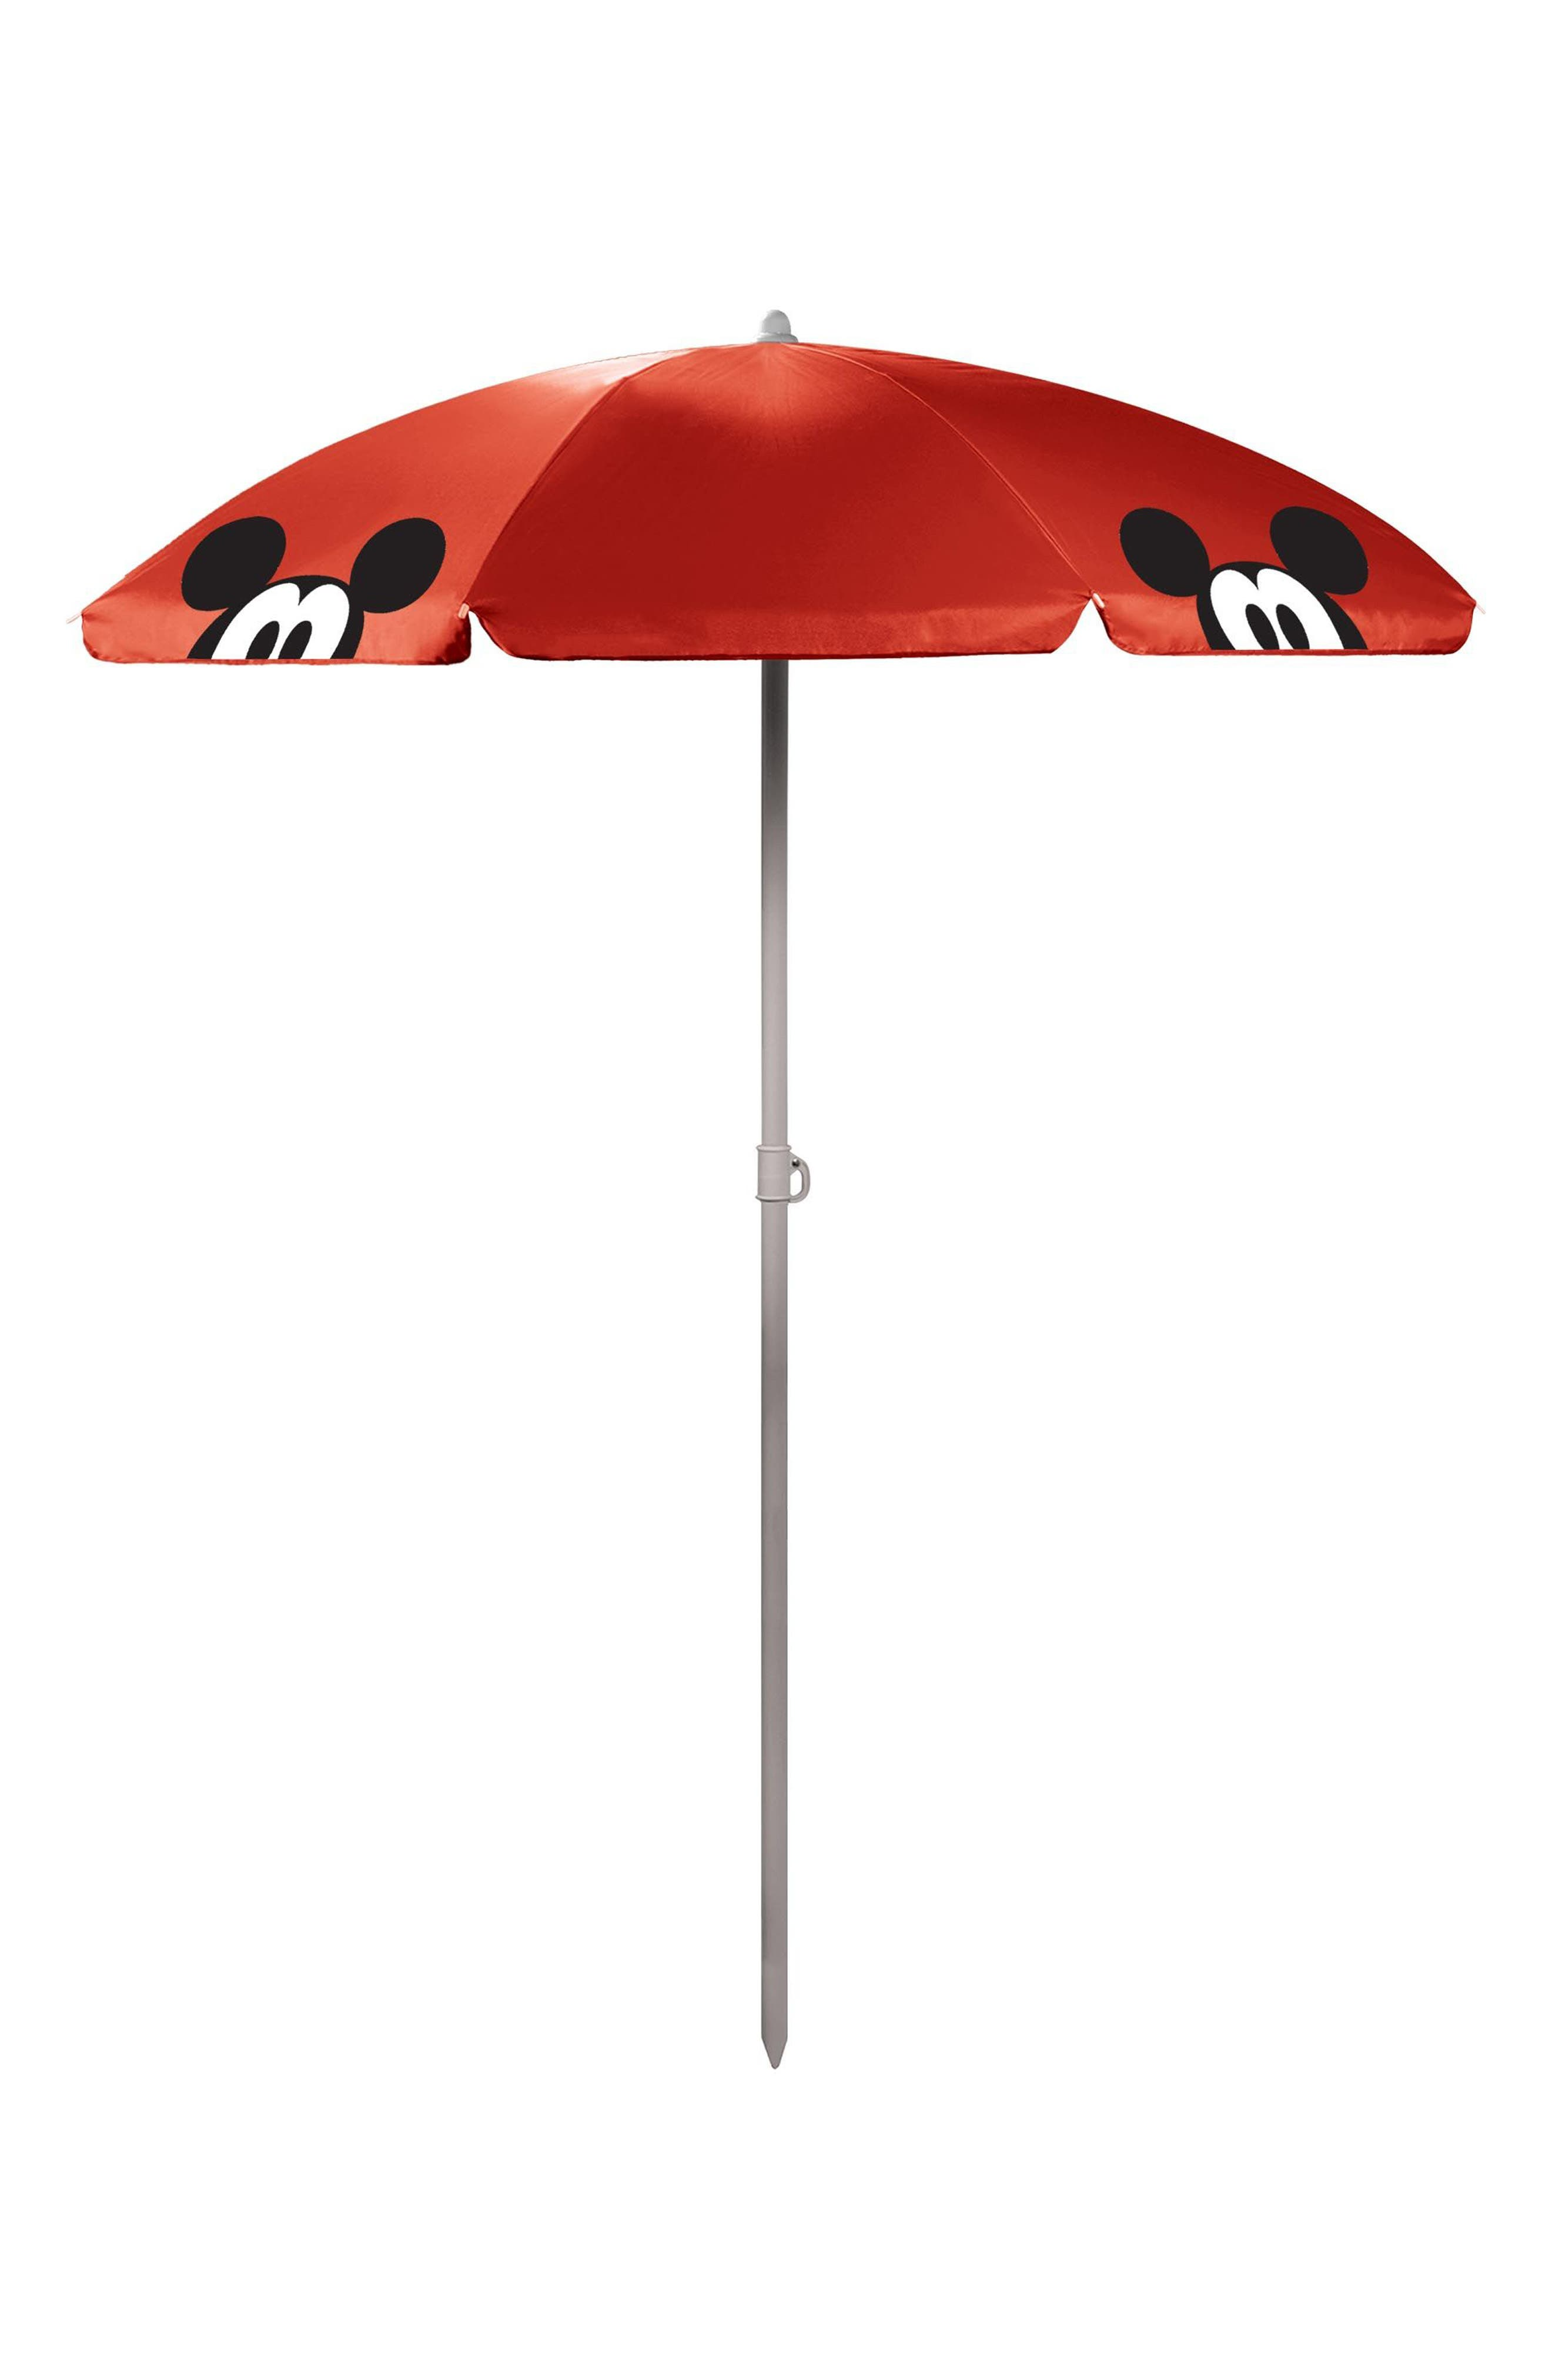 Disney<sup>®</sup> Mickey Mouse Portable Beach & Picnic Umbrella,                             Main thumbnail 1, color,                             600